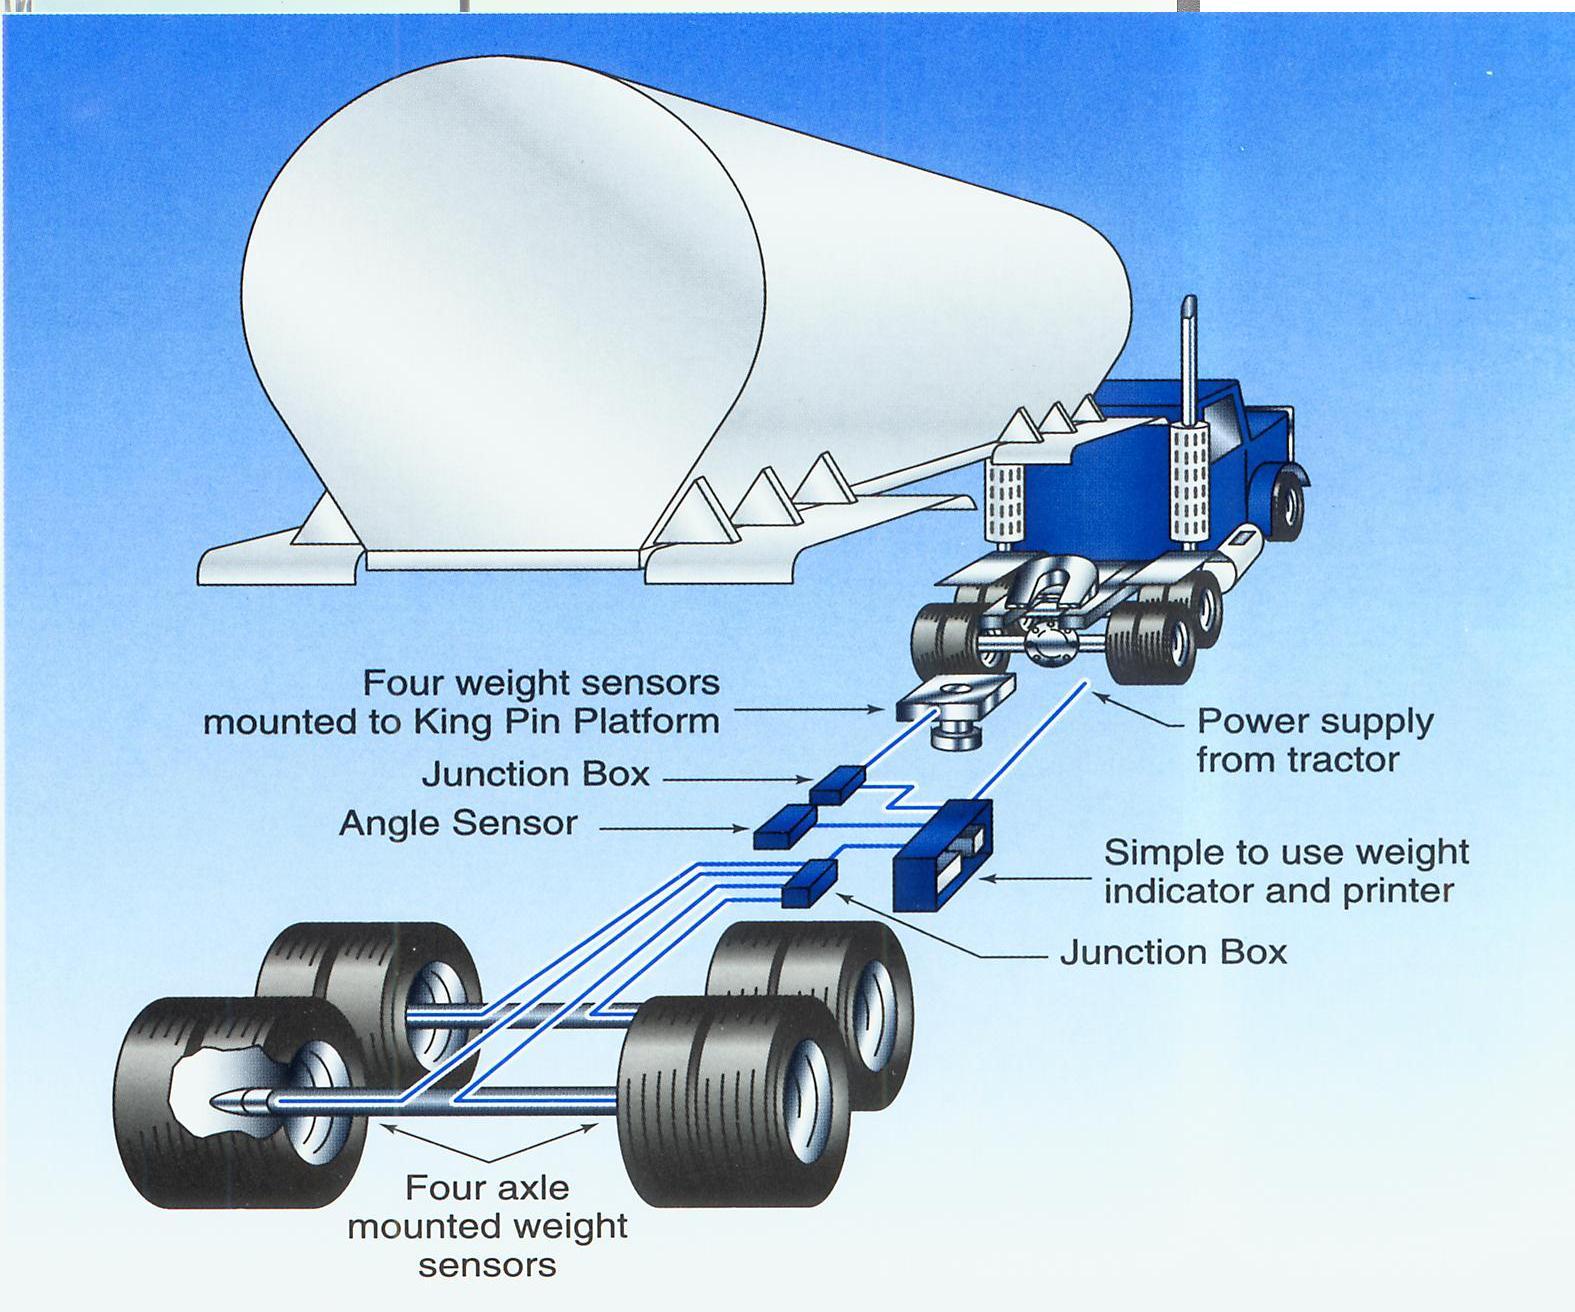 lg rotary compressor wiring diagram wirdig mi t m wiring diagram image wiring diagram amp engine schematic